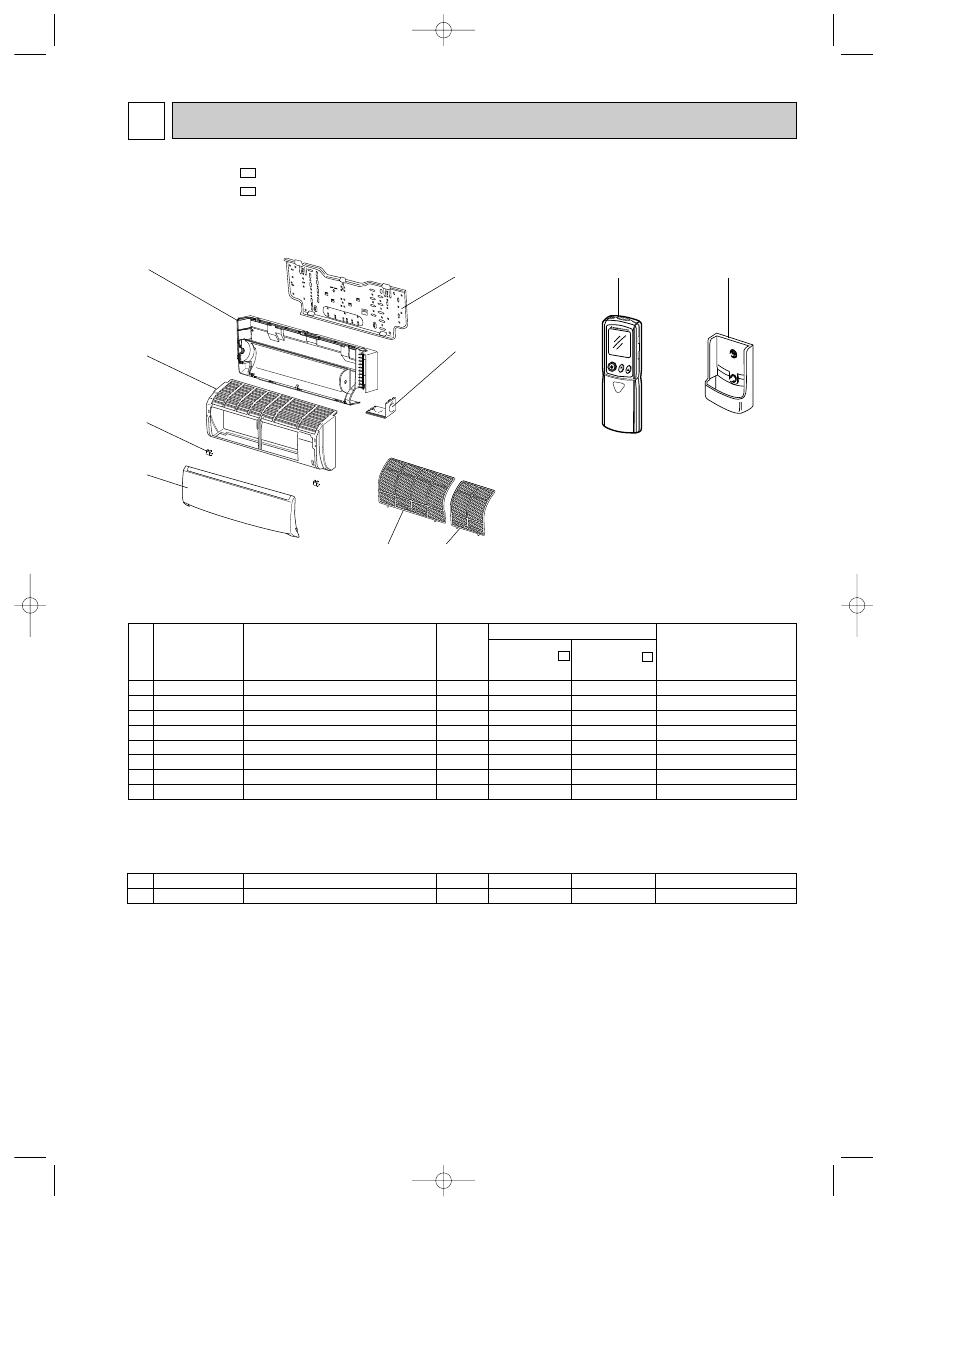 Parts List 11 Mitsubishi Electric Msz Fa35va User Manual Page 35 Wiring Diagram 40